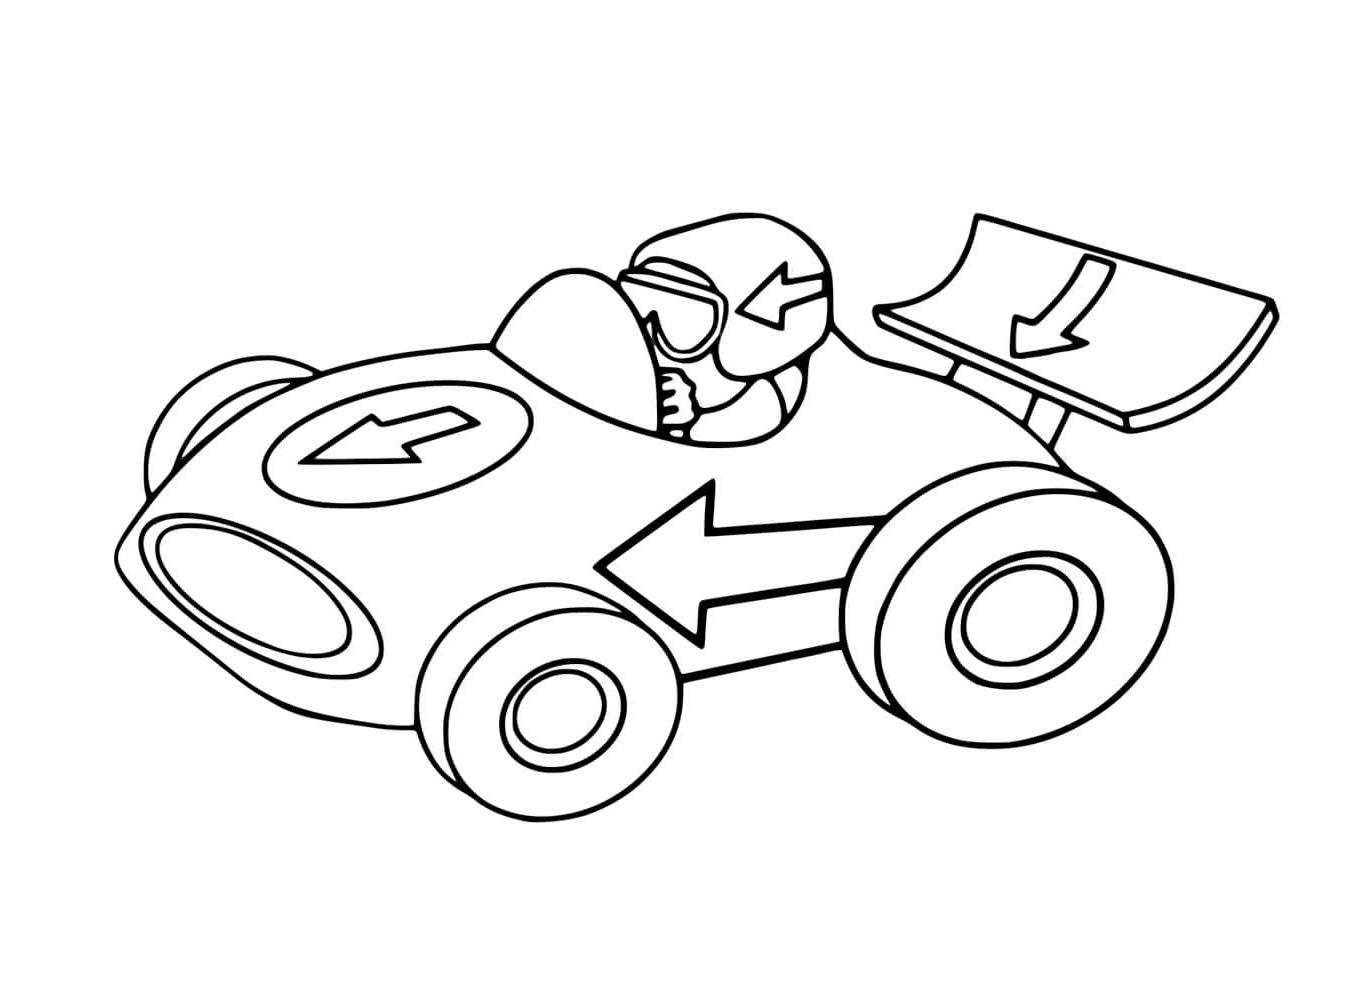 Race Car Color Pages for Kids